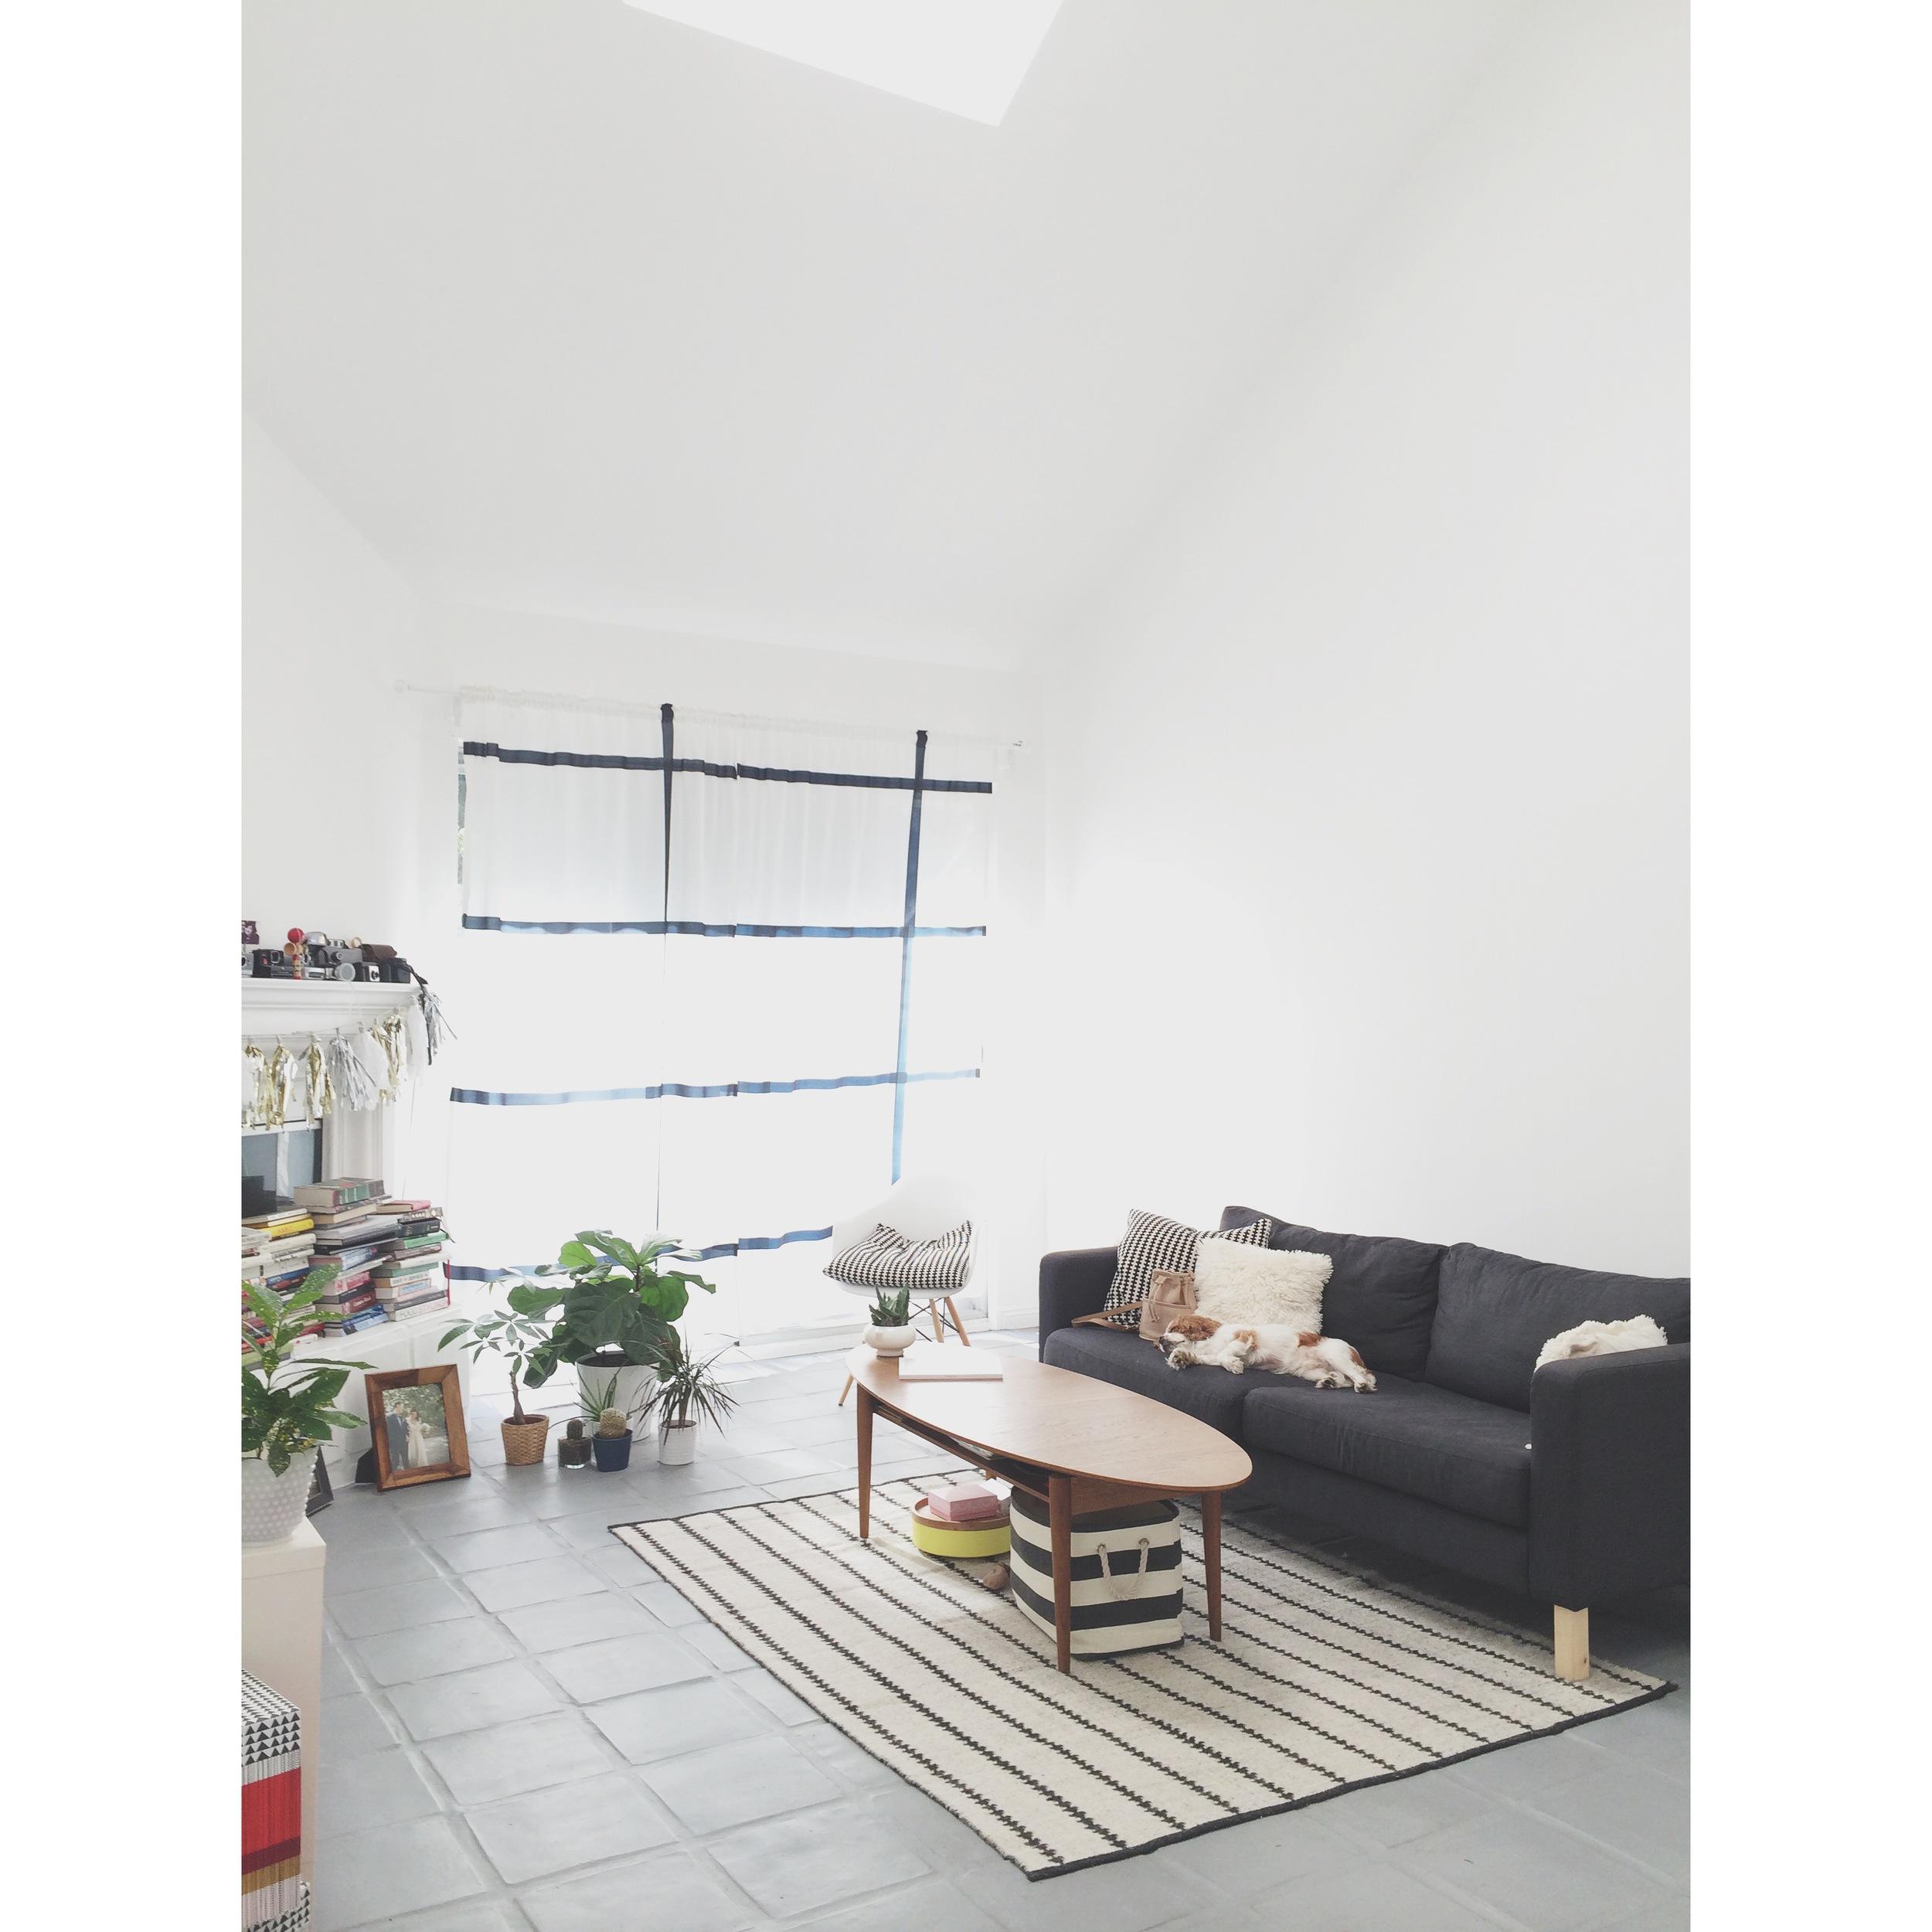 Ikea Karlstad Sofa & Stockholm Coffee Table (older version) both craigslist scores, Nate Berkus Reversible Rug from 2012/2013 season.